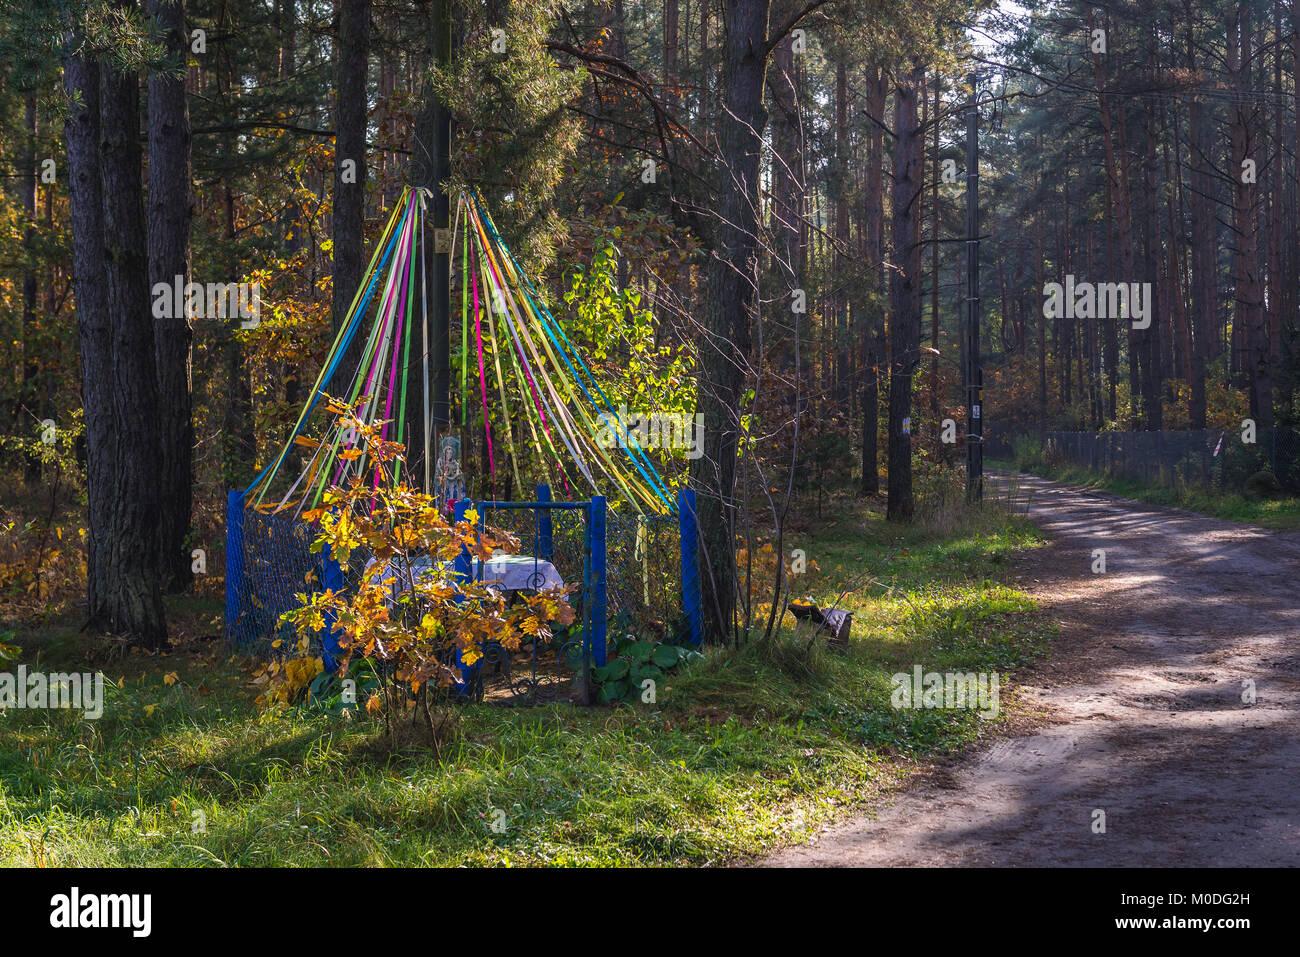 Bildstock in kampinoski Wald, große Wälder komplex in der Woiwodschaft Masowien in Polen Stockbild